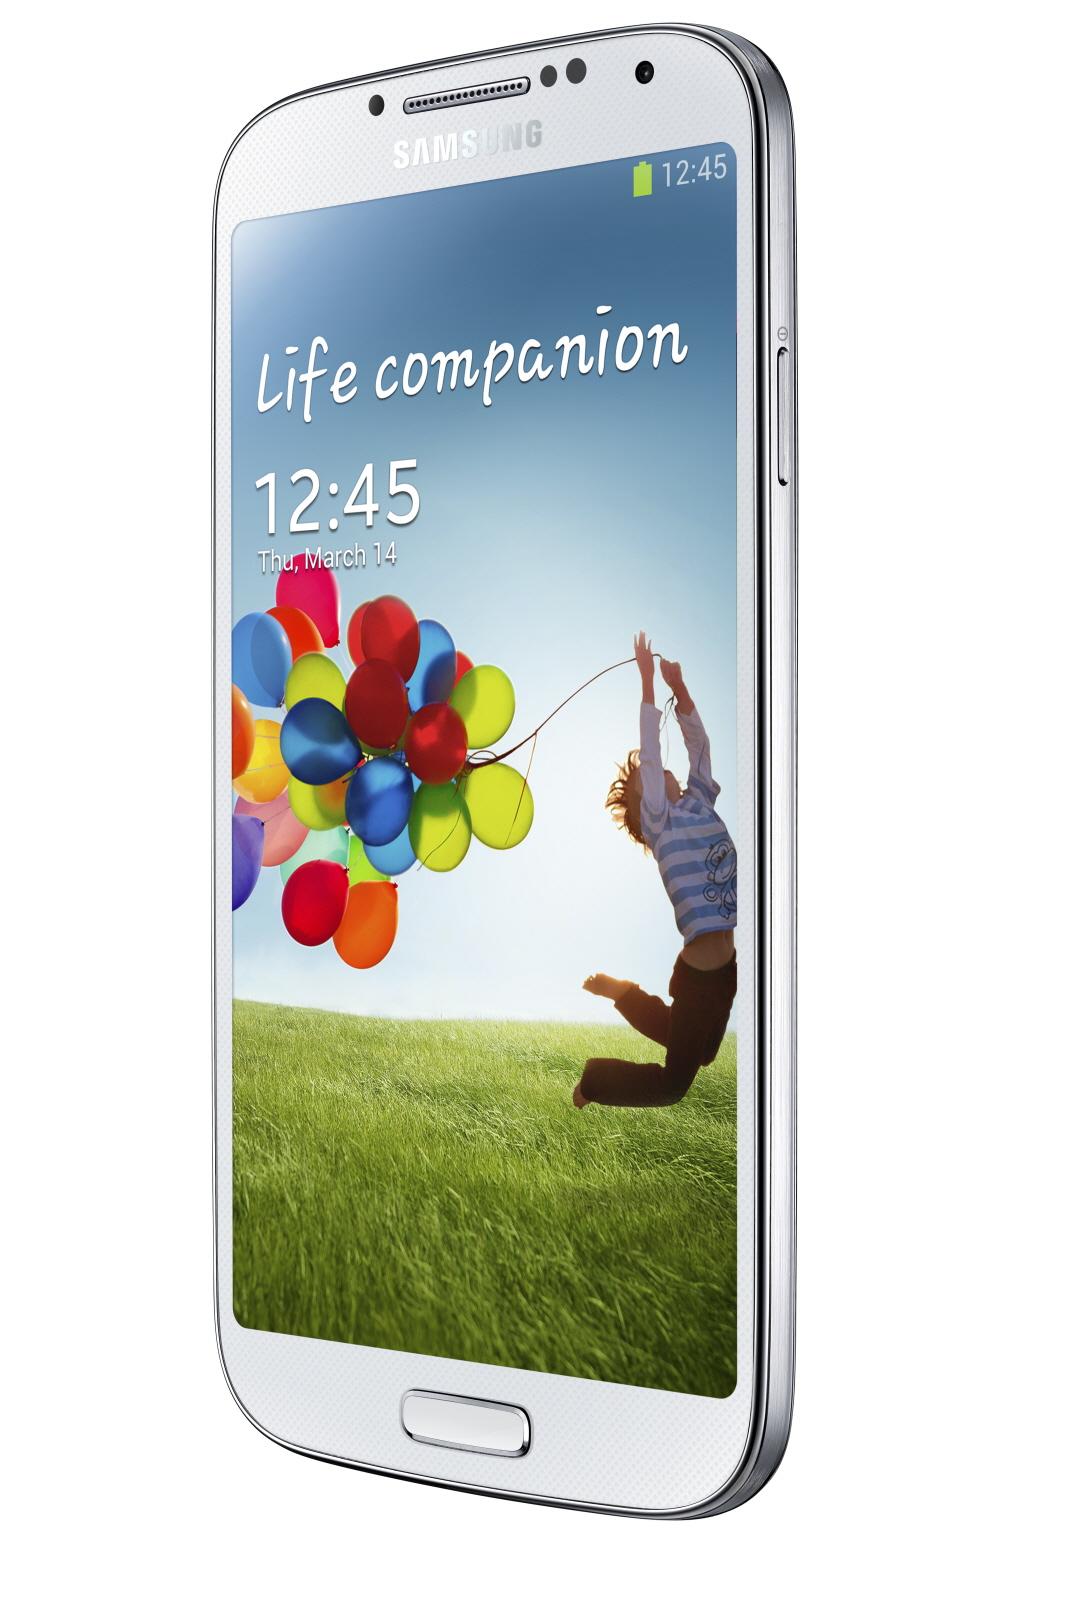 SamsungS4g